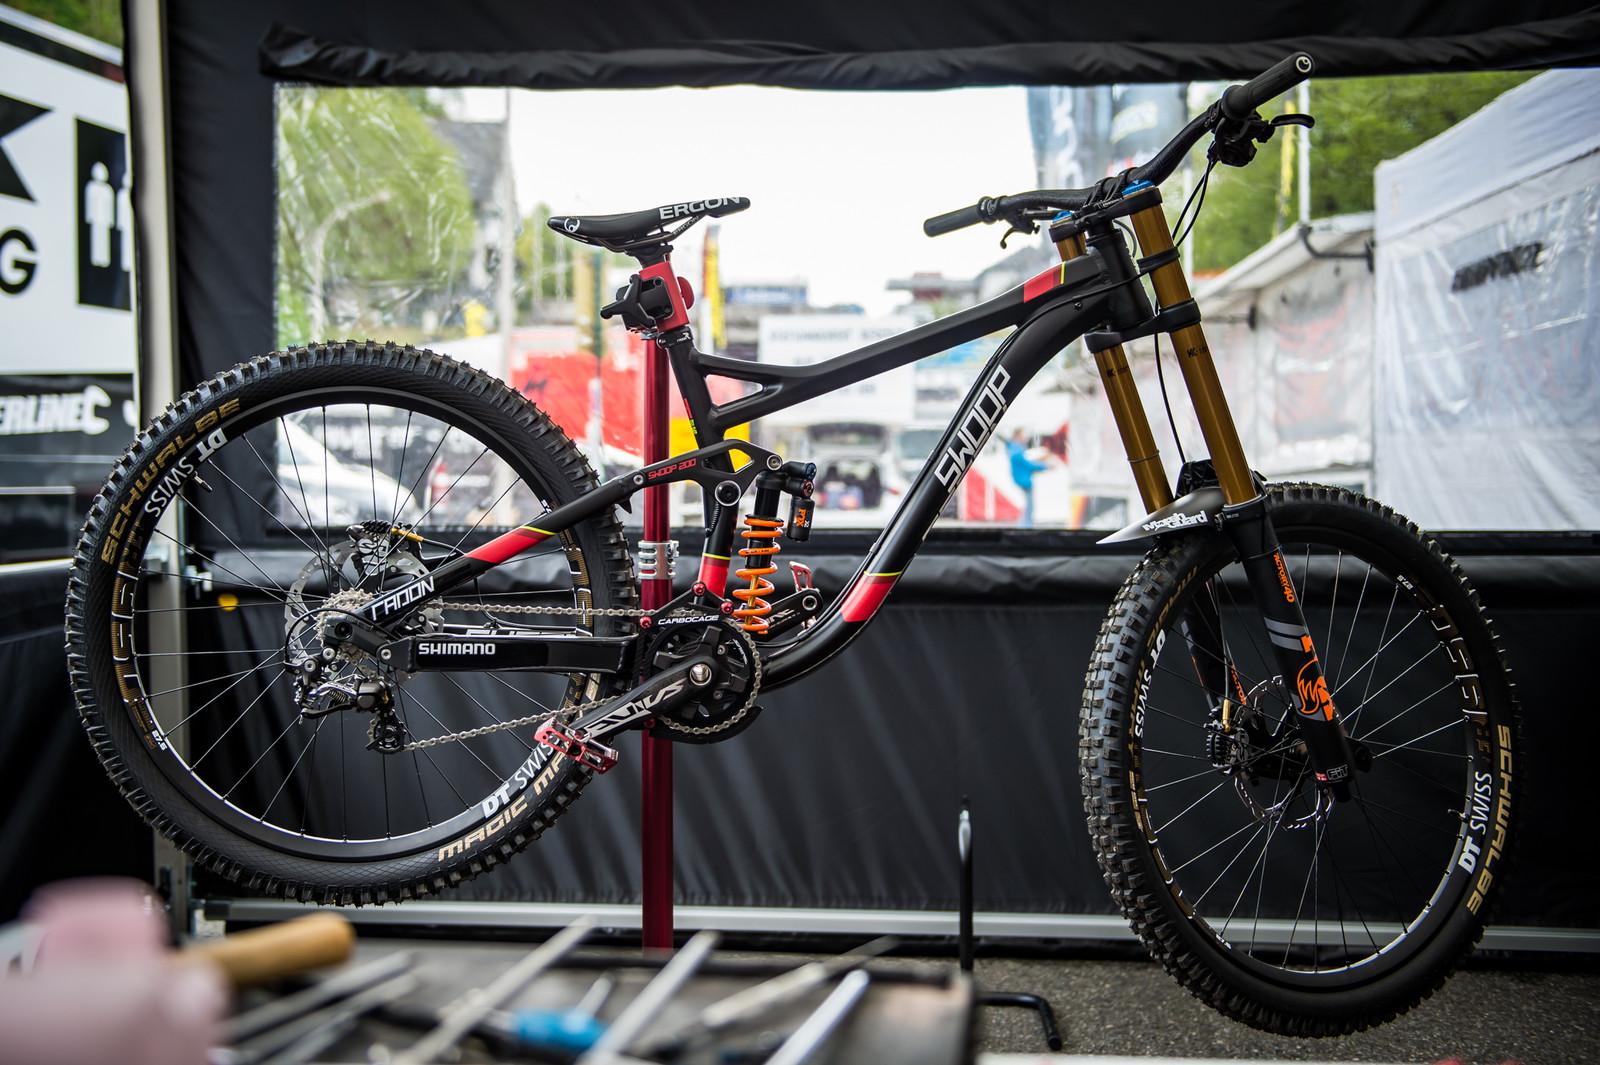 Manon Carpenter's Radon Swoop 200 - 2017 Lourdes World Cup Pit Bits - Mountain Biking Pictures - Vital MTB